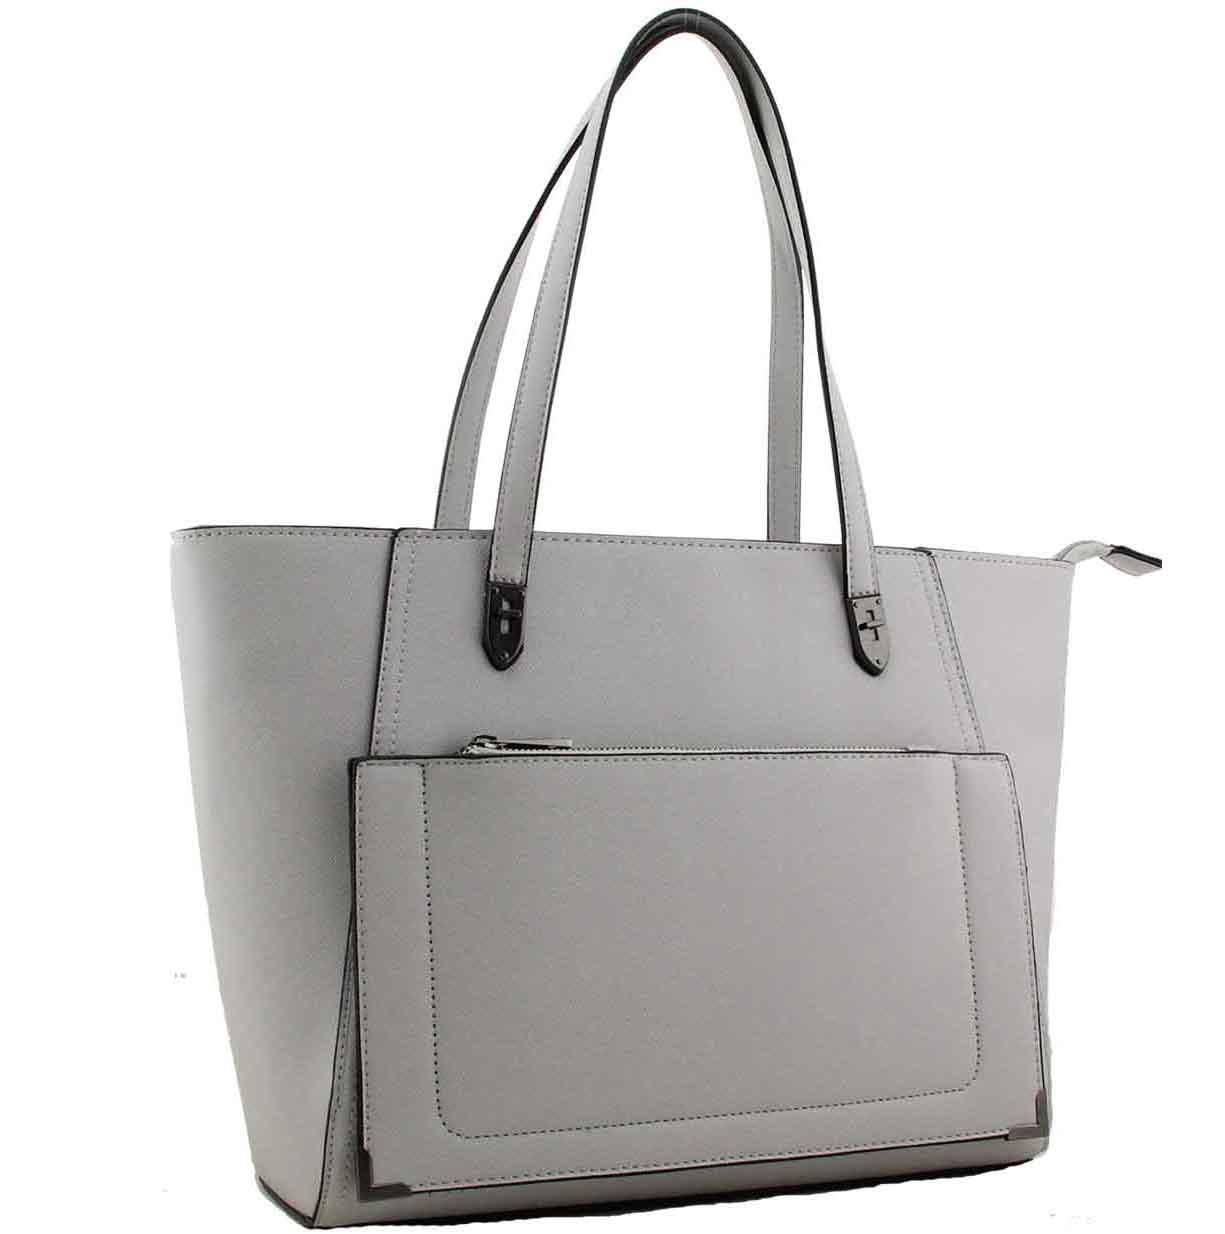 c7bd07a43f71 H1653 - Trista fashion tote designer handbag grey ~ BAGZONE ...